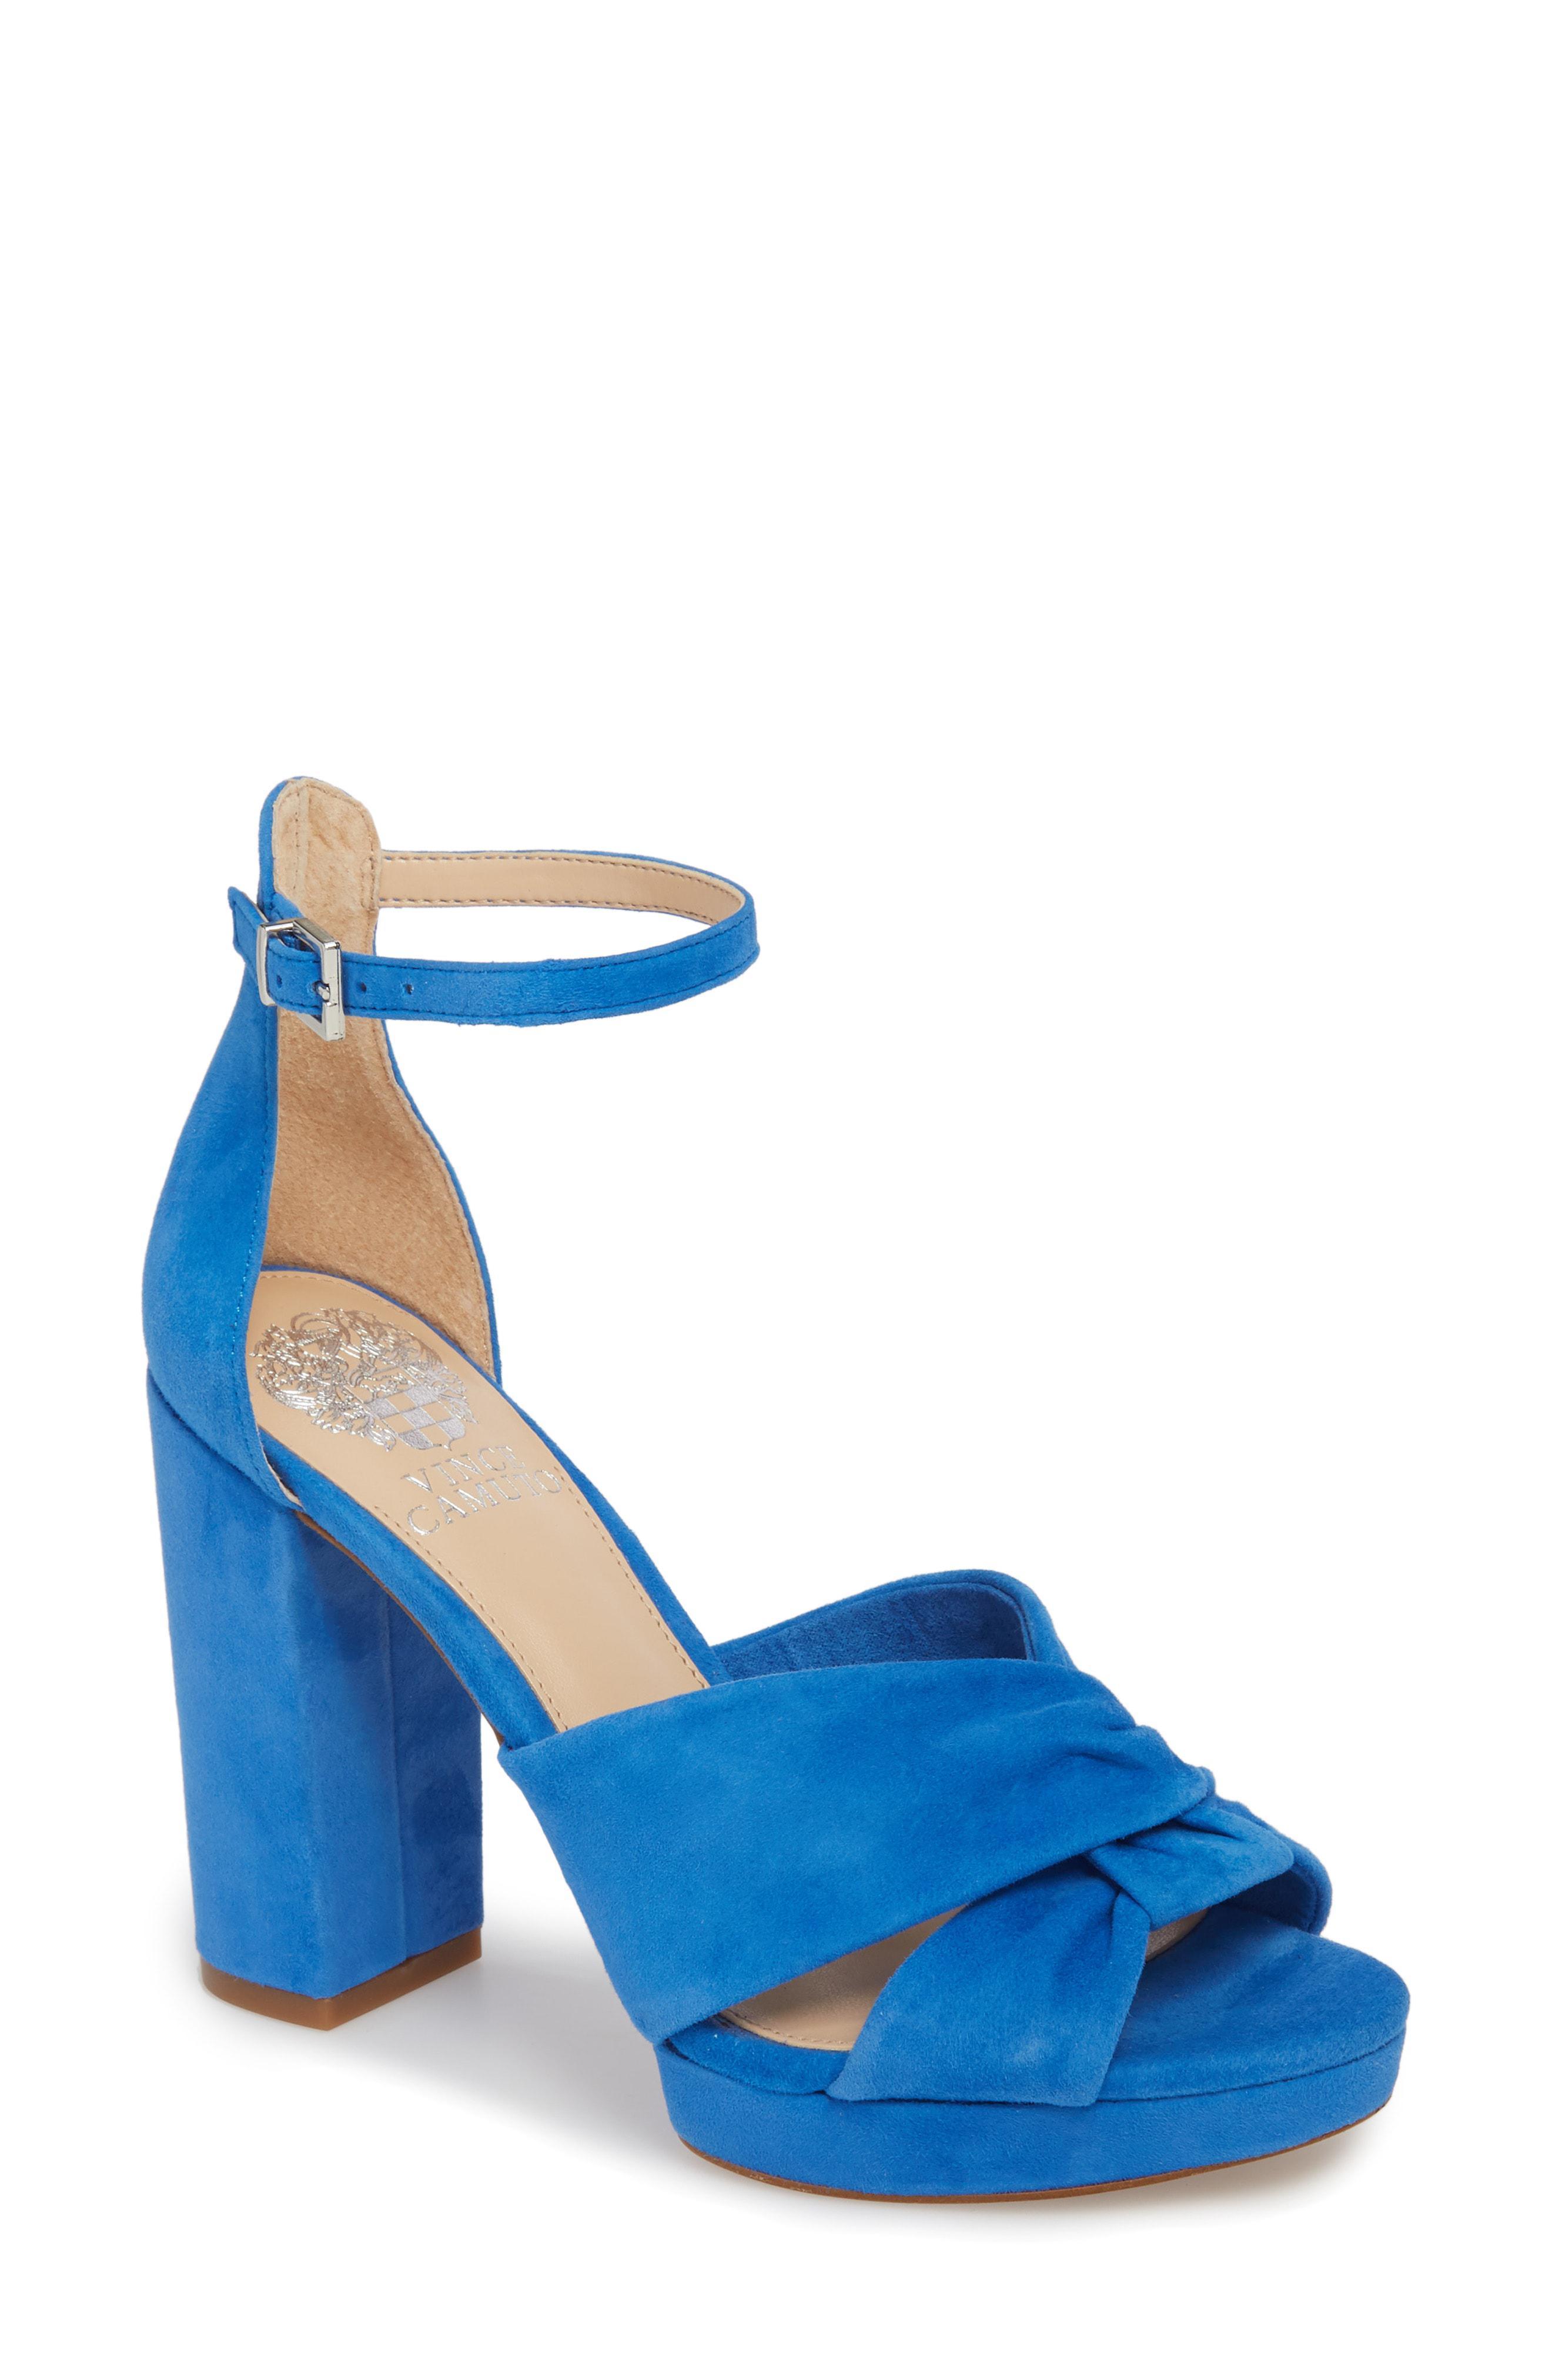 f496598822f7 Lyst - Vince Camuto Corlesta Sandal in Blue